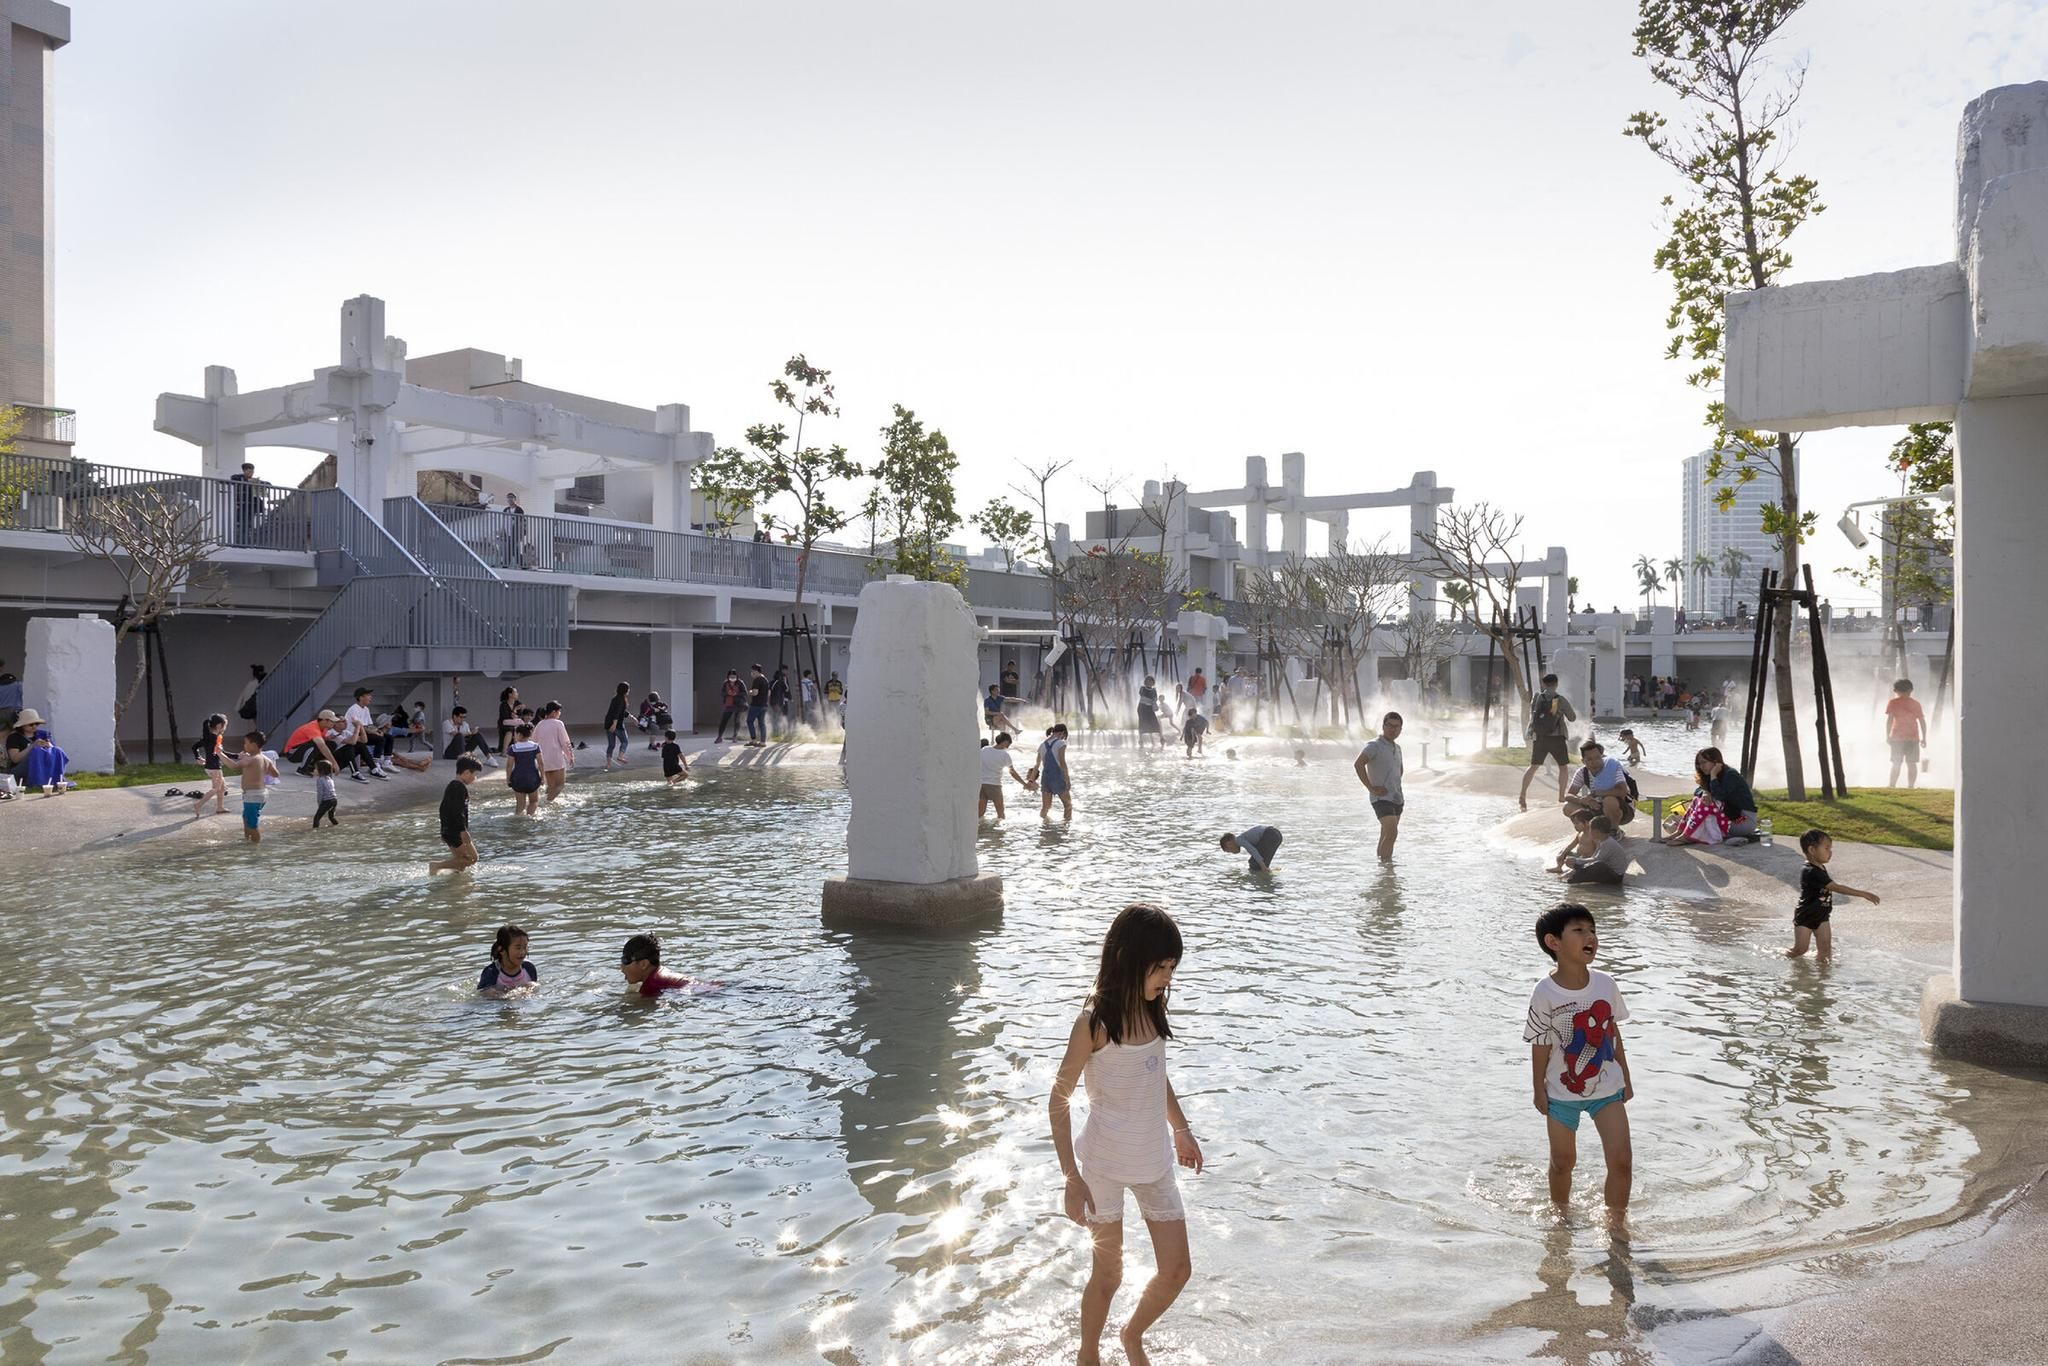 MRDV Transforms Abandoned Taiwanese Shopping Mall into Urban Lagoon